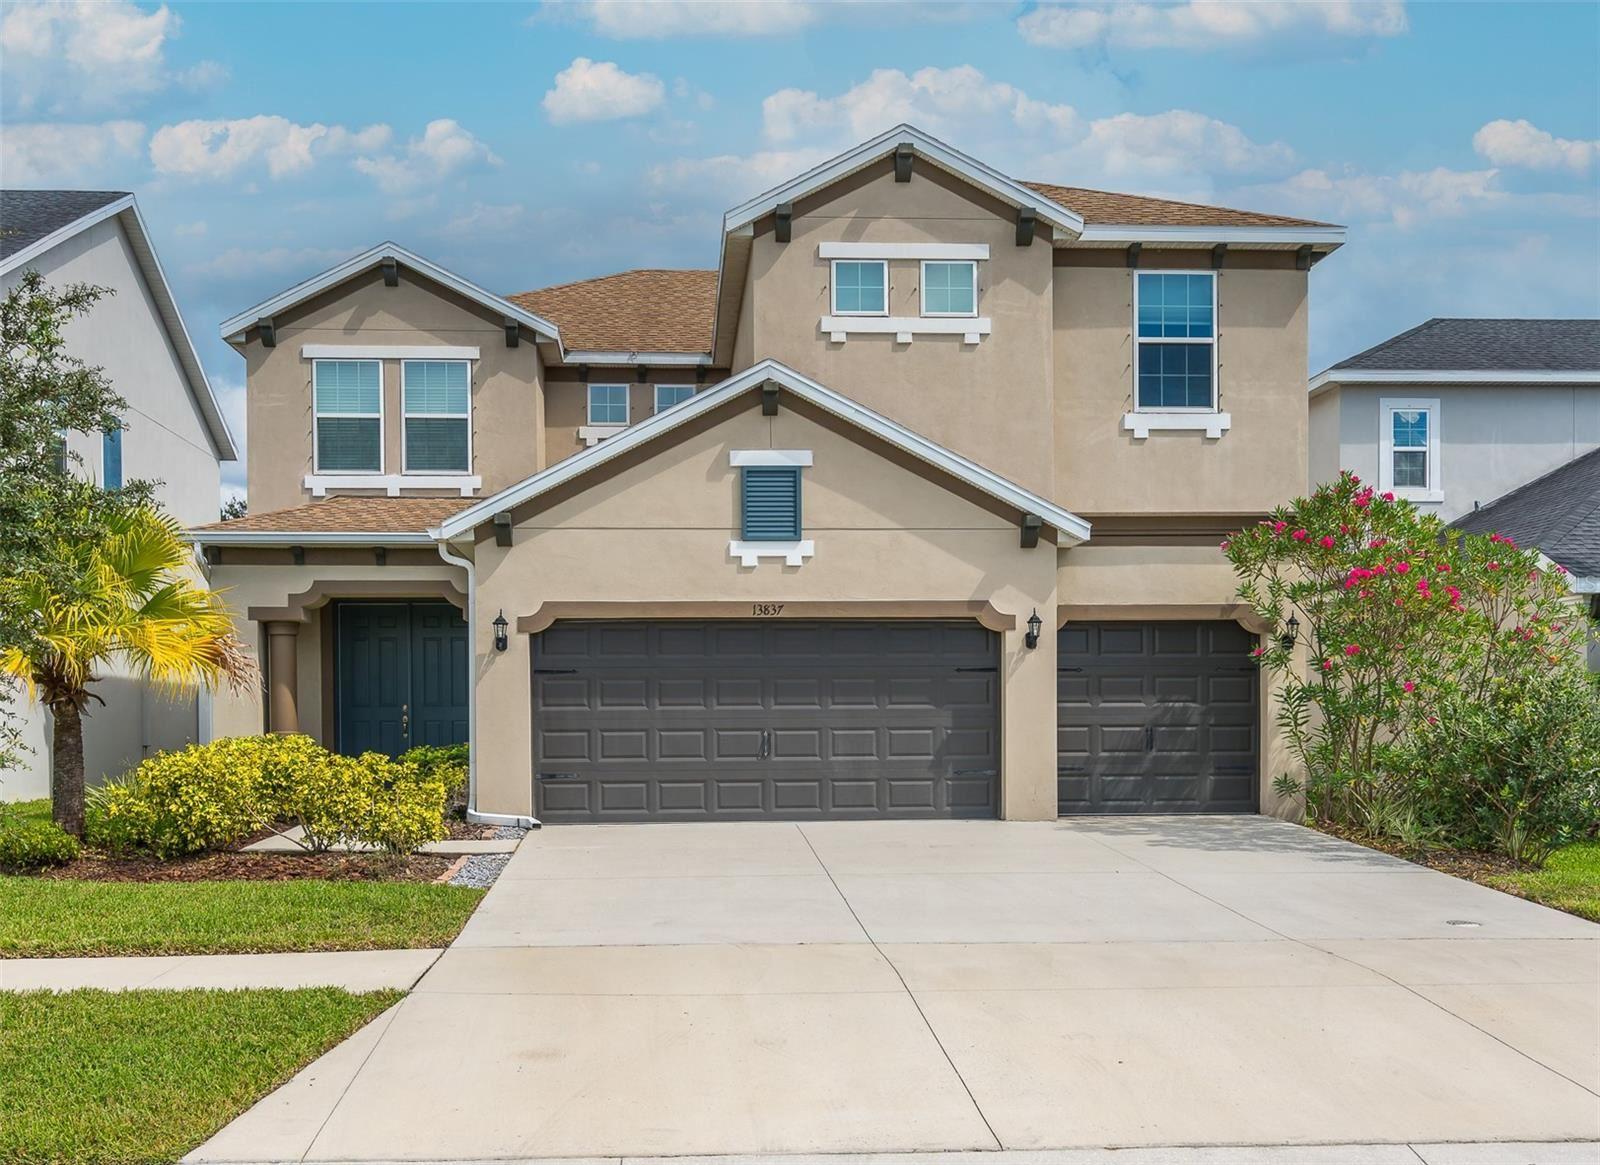 13837 FAIRWAY BUNKER DRIVE, Tampa, FL 33626 - #: T3333709